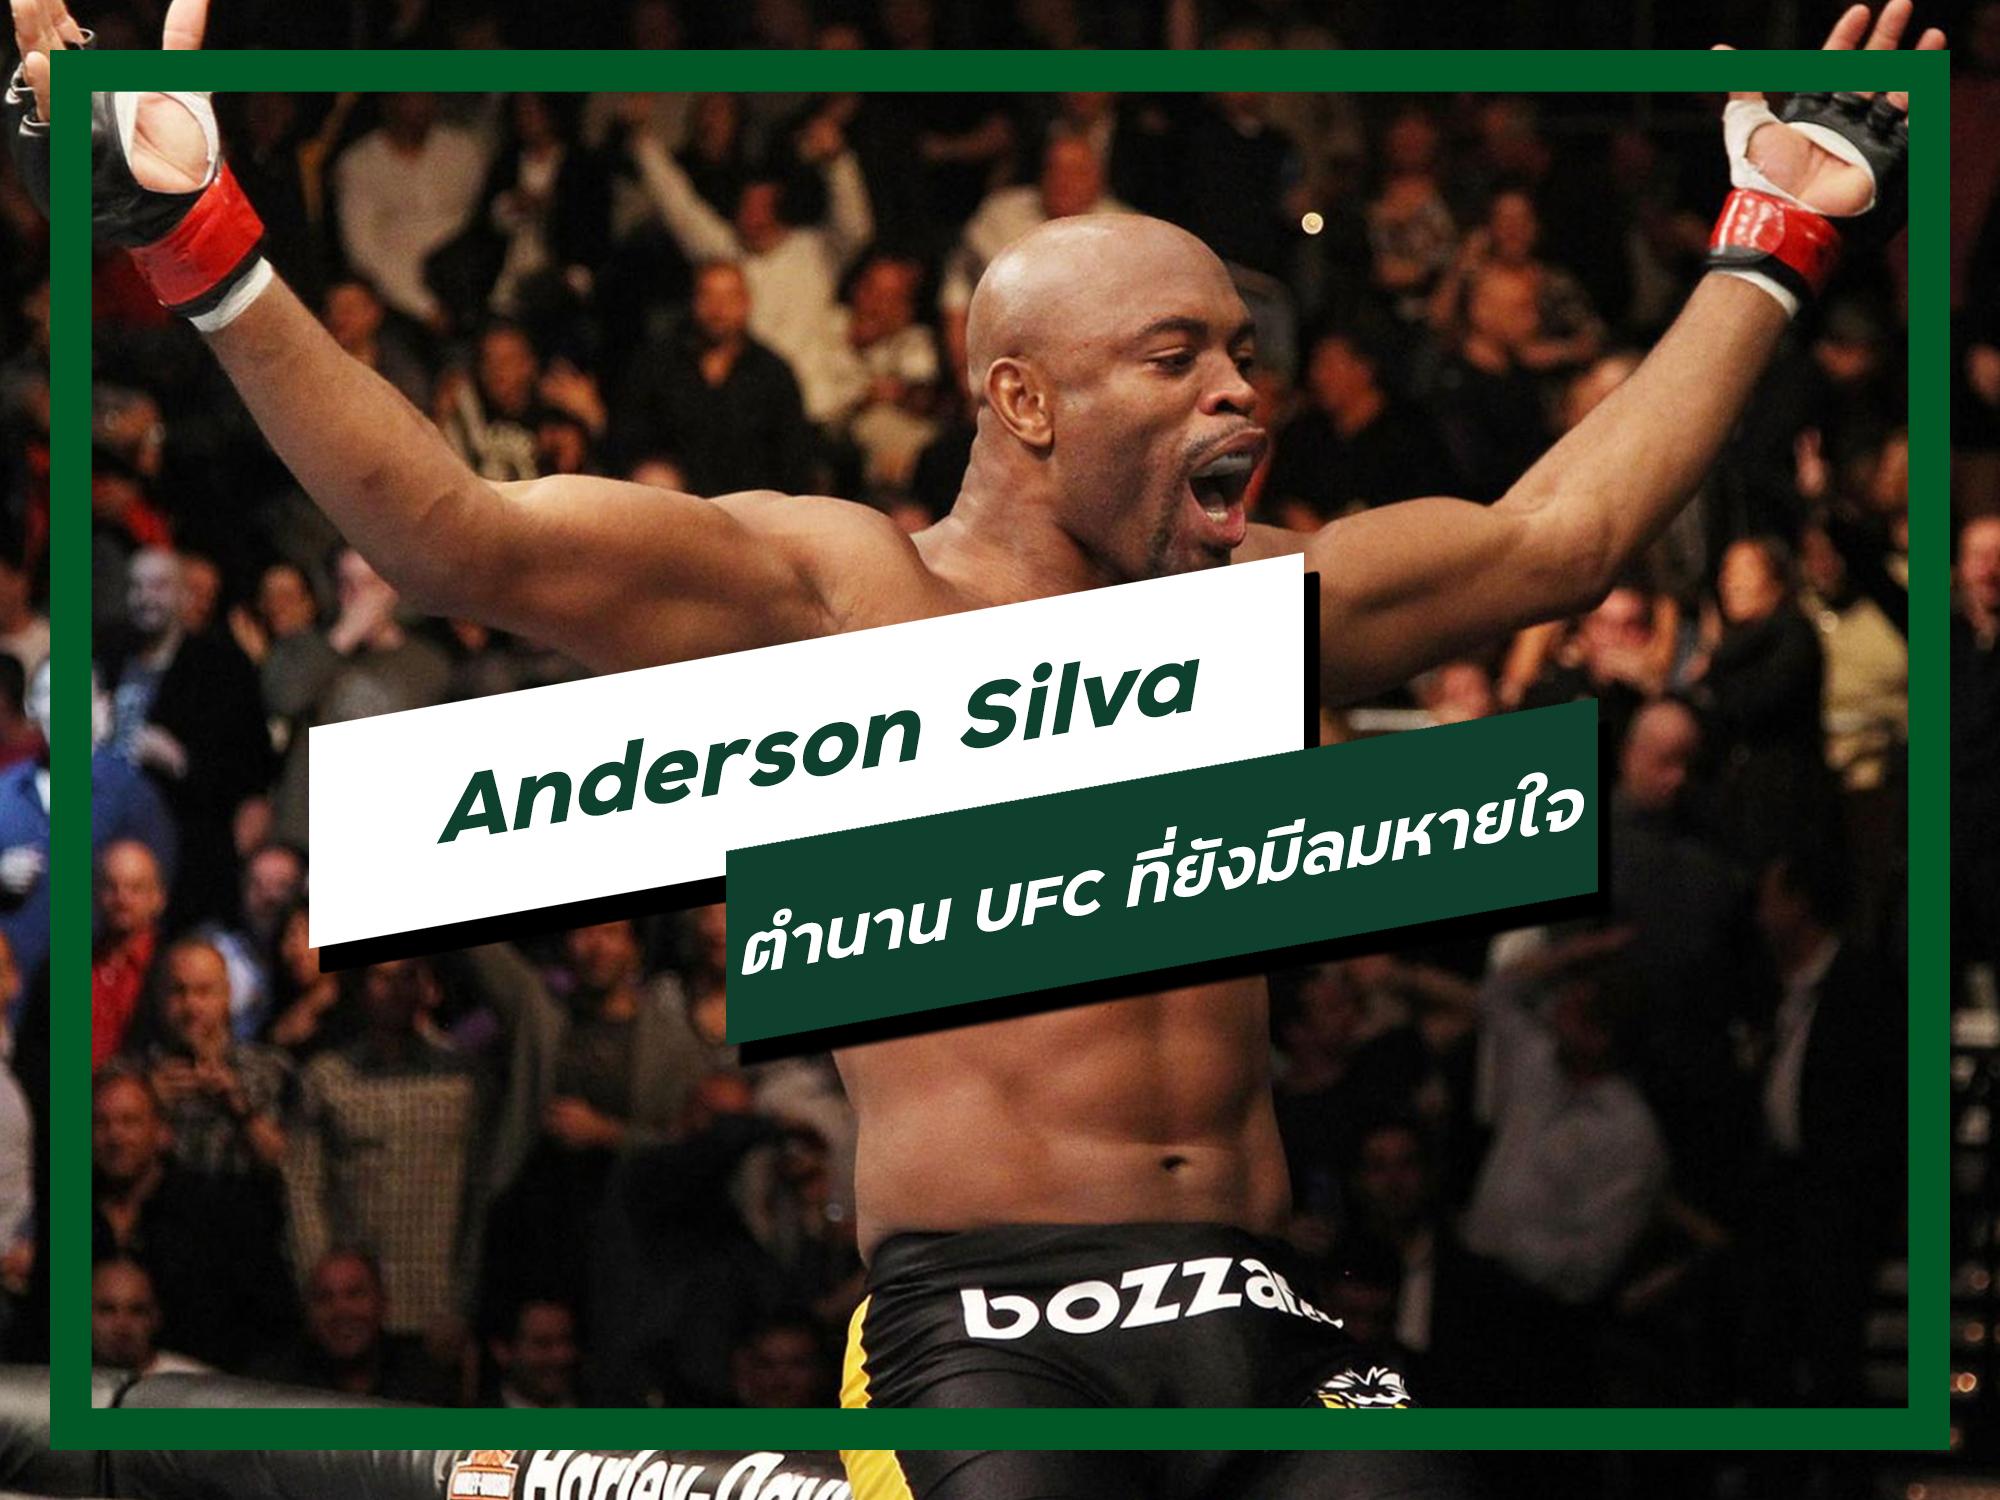 Anderson Silva ตำนาน UFC ที่ยังมีลมหายใจ